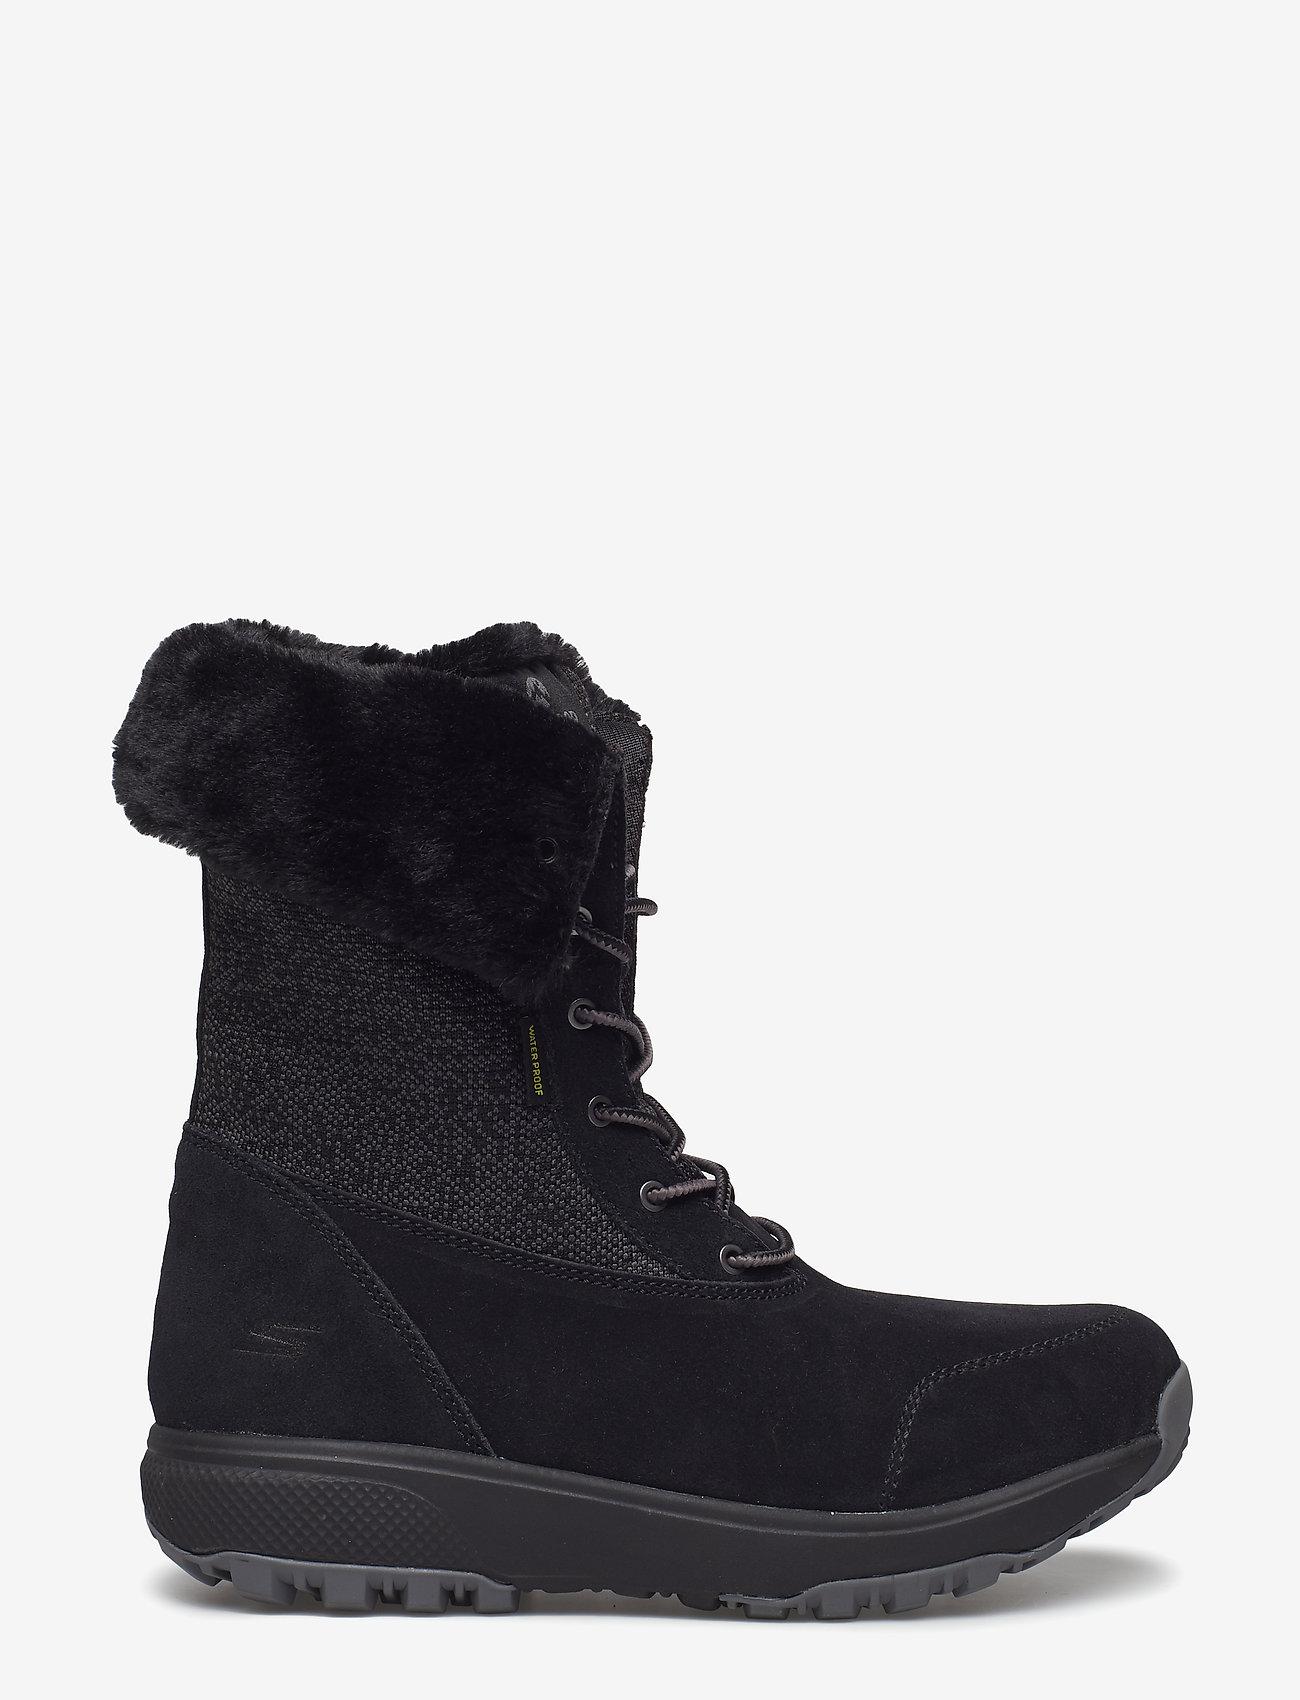 Skechers - Womens Outdoors Ultra - Waterproof - flade ankelstøvler - bbk black - 1